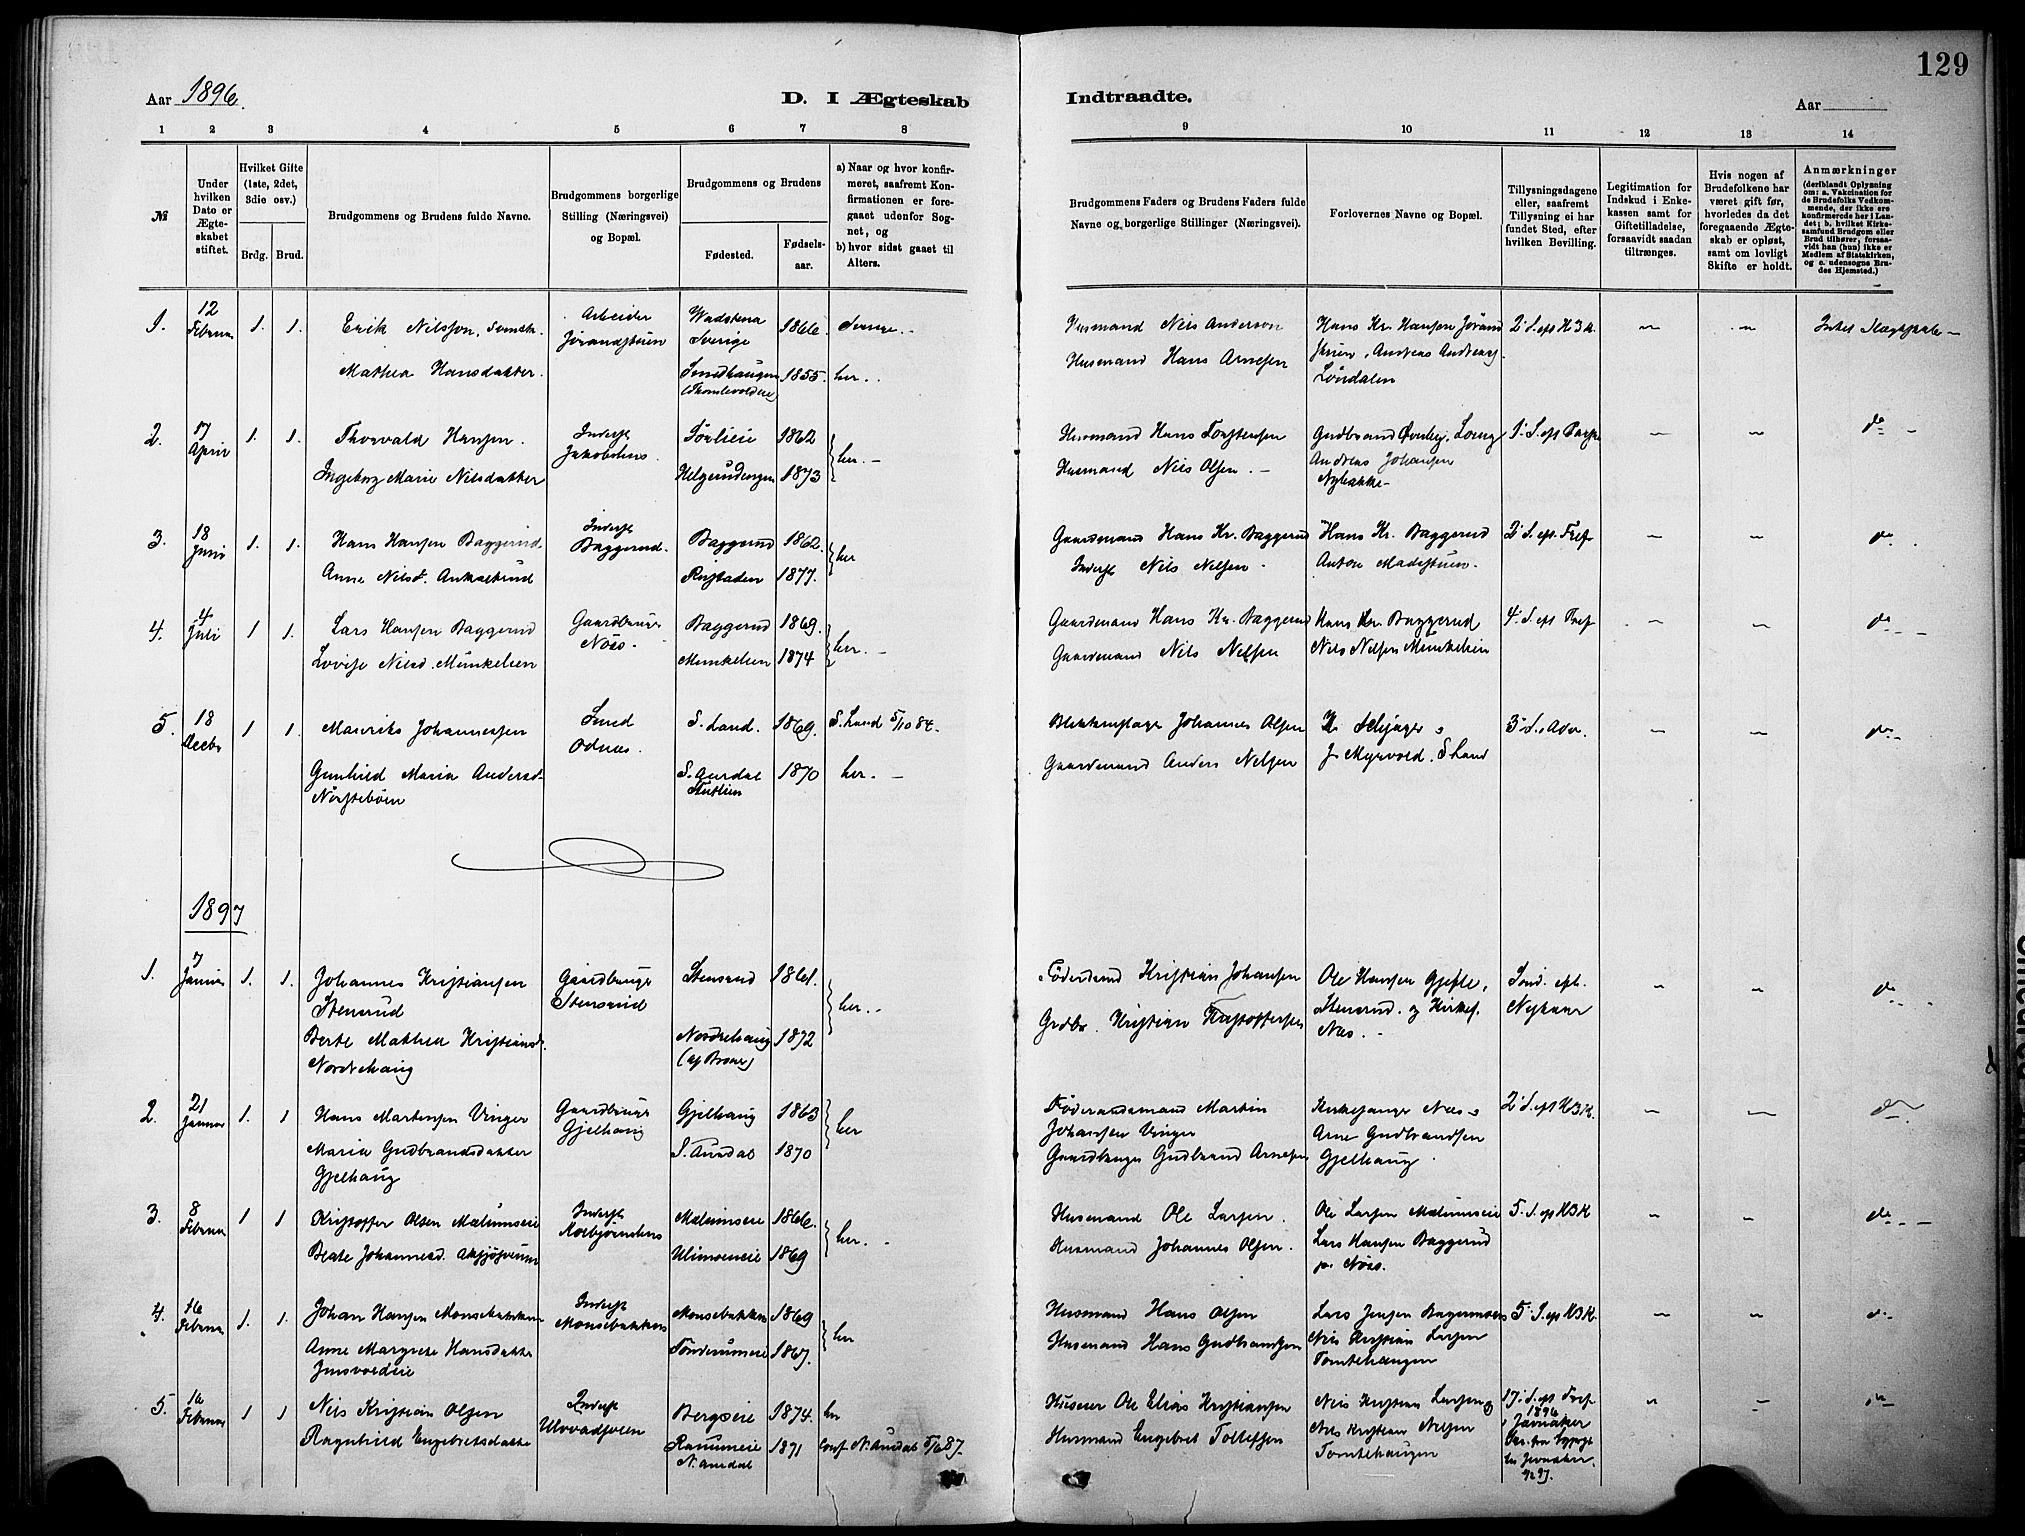 SAH, Nordre Land prestekontor, Ministerialbok nr. 5, 1882-1903, s. 129